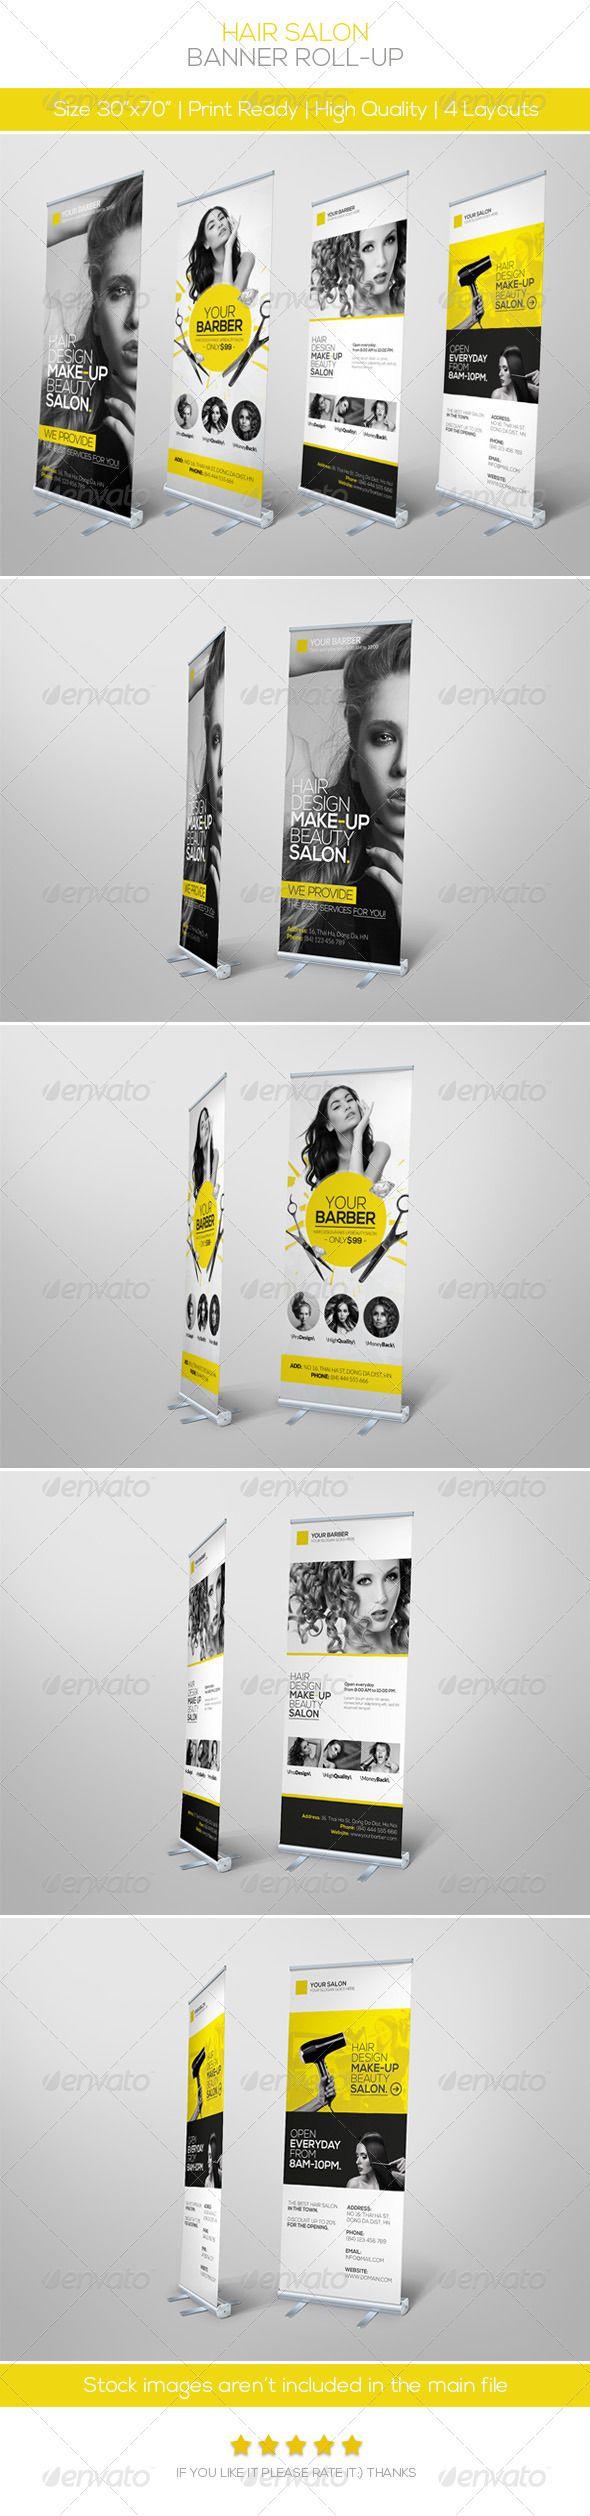 Premium Hair Salon Roll-up Banner - Signage Print Templates